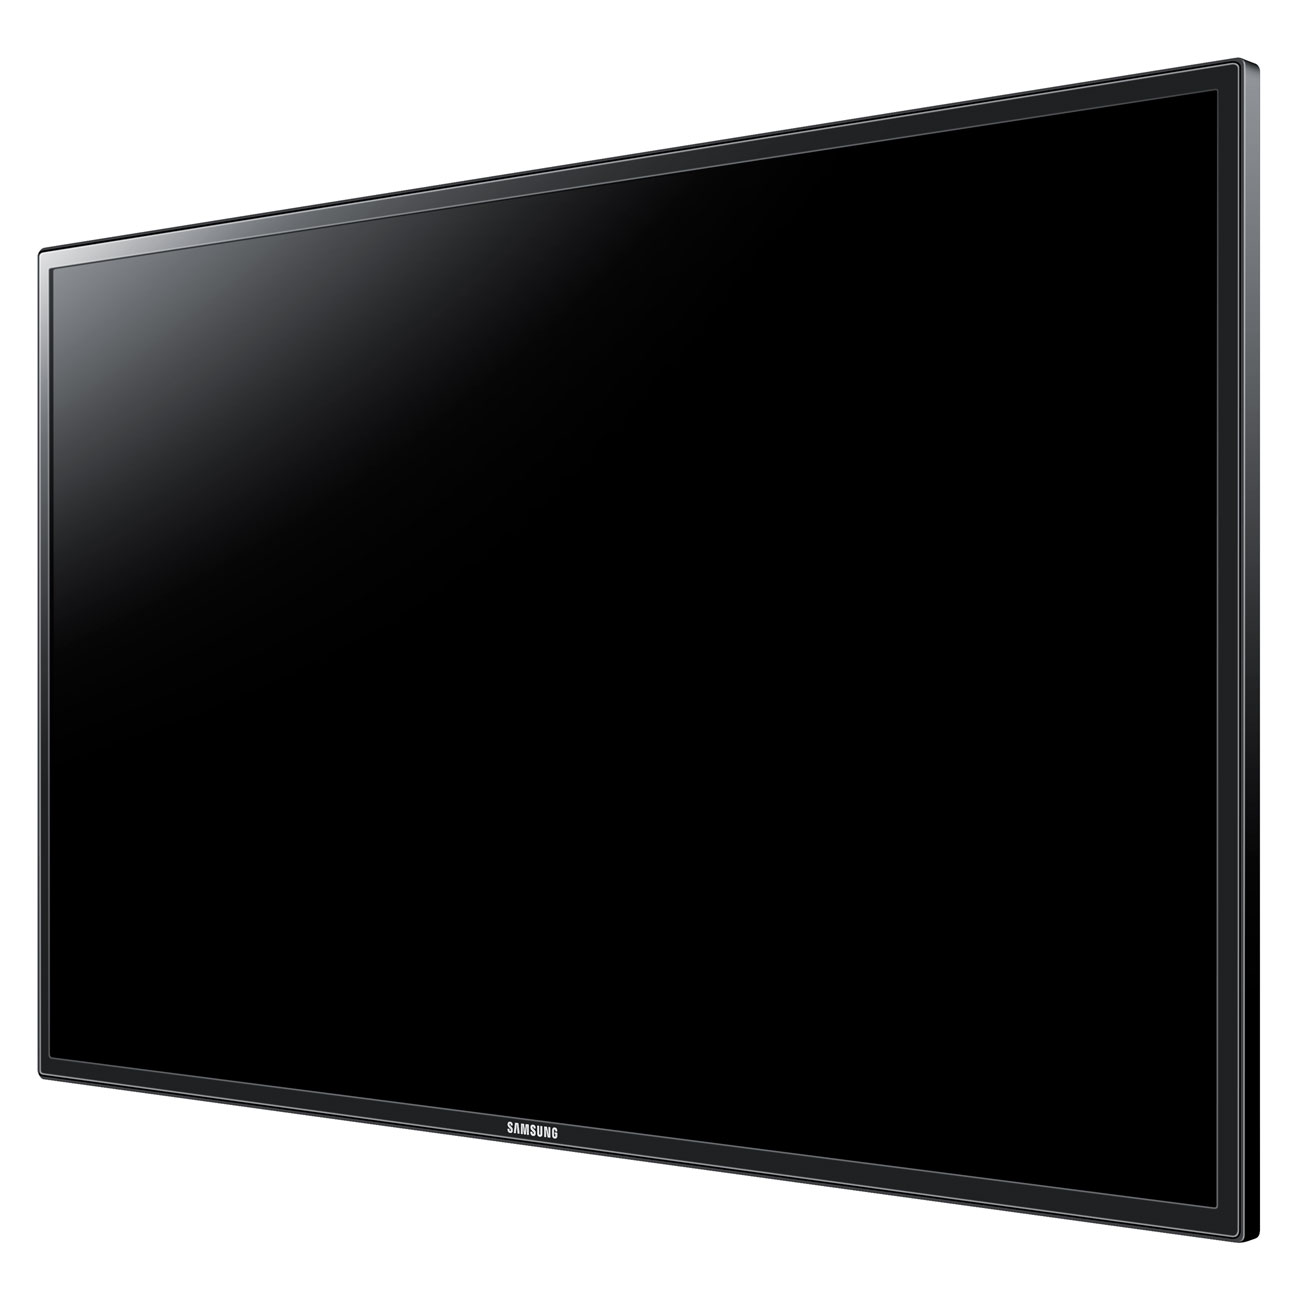 Samsung 46 led me46a ecran dynamique samsung sur for Samsung photo ecran